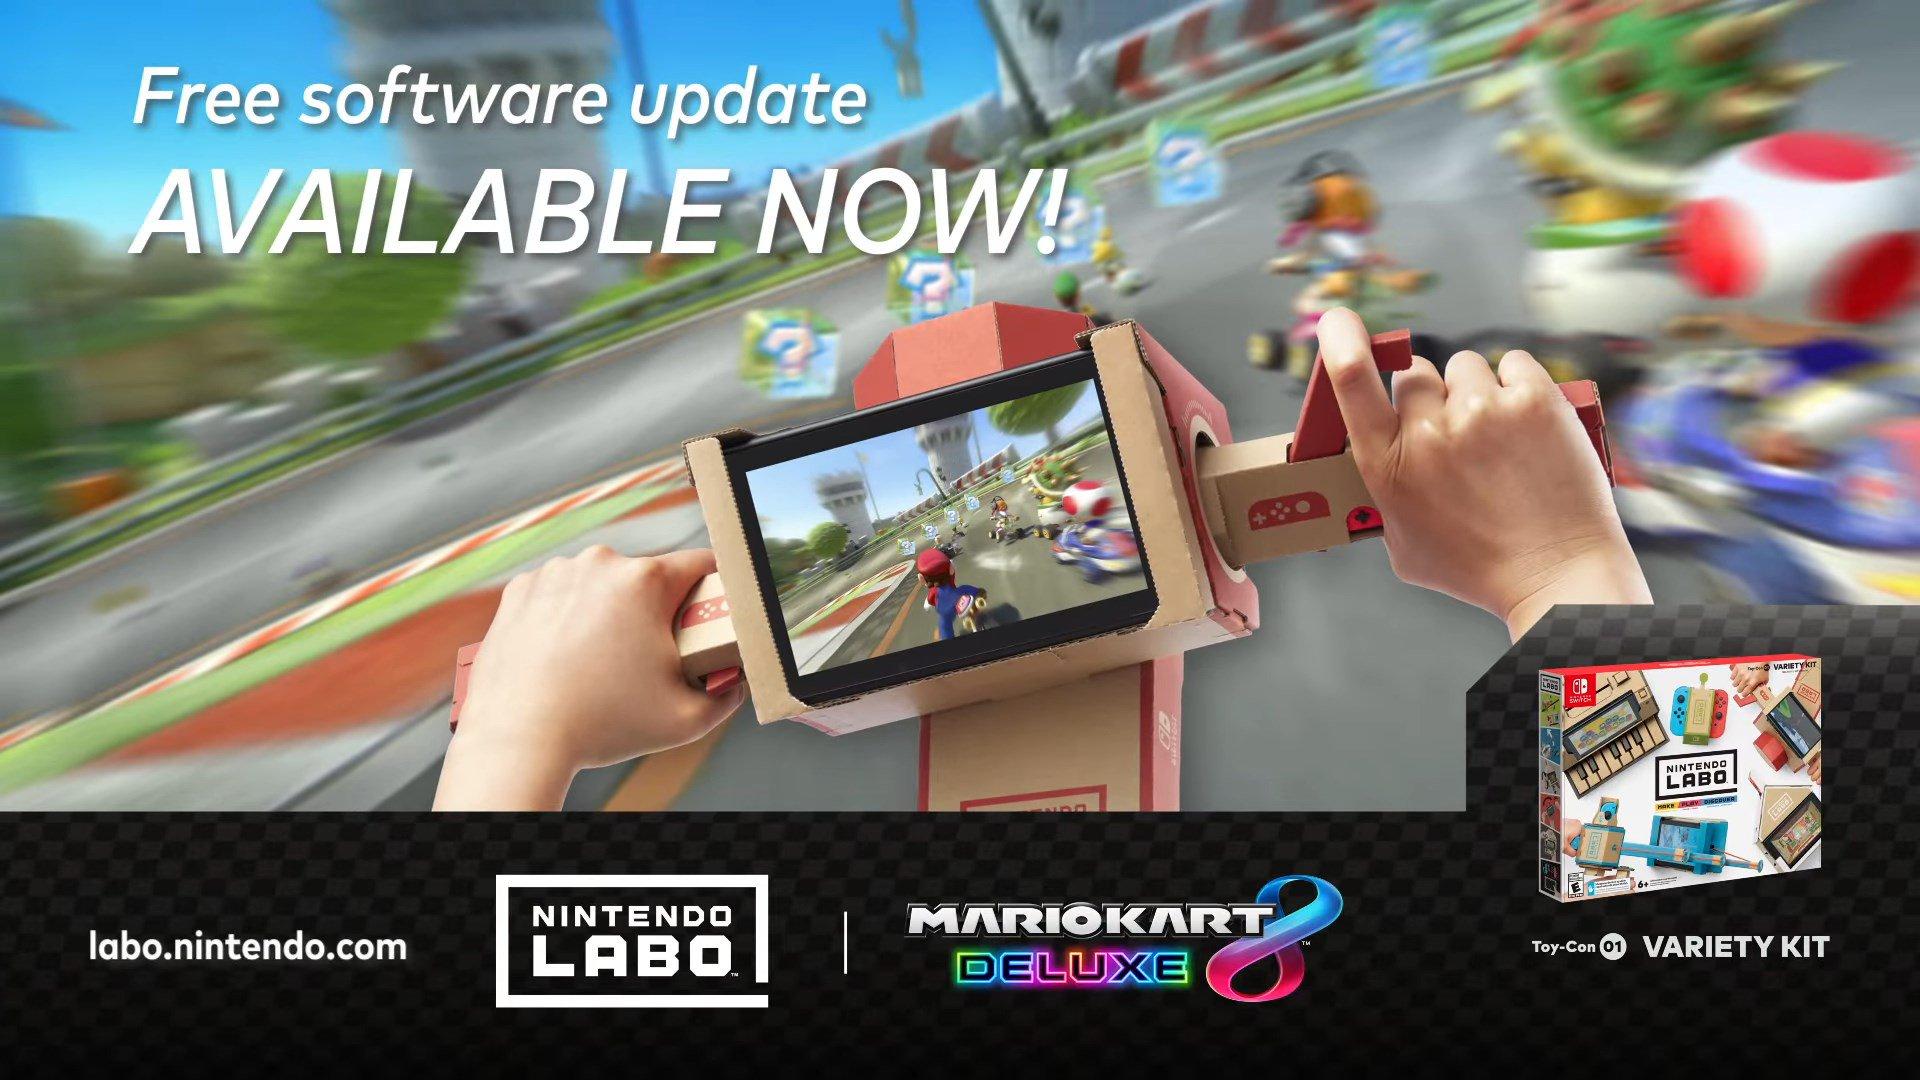 Mario Kart 8 Deluxe to Support Nintendo Labo